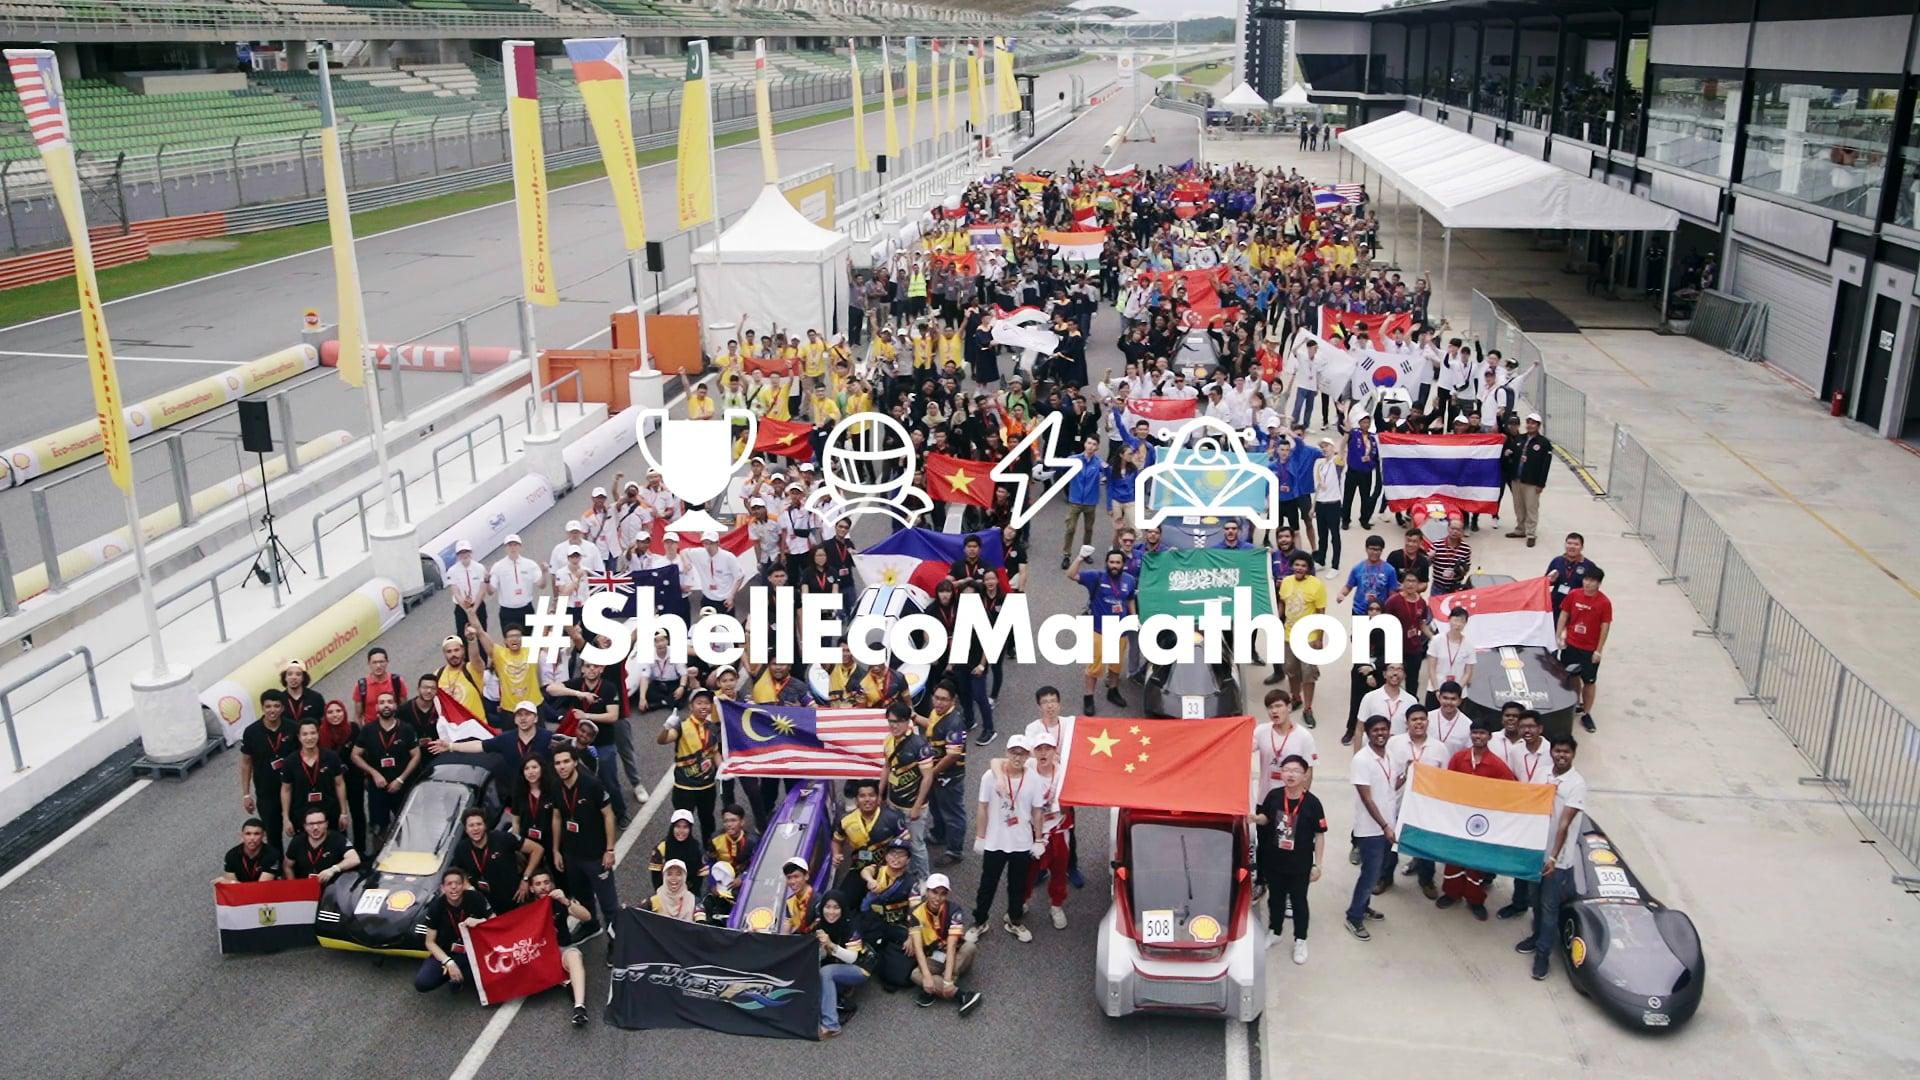 ShellEcoMarathonAsia 2019